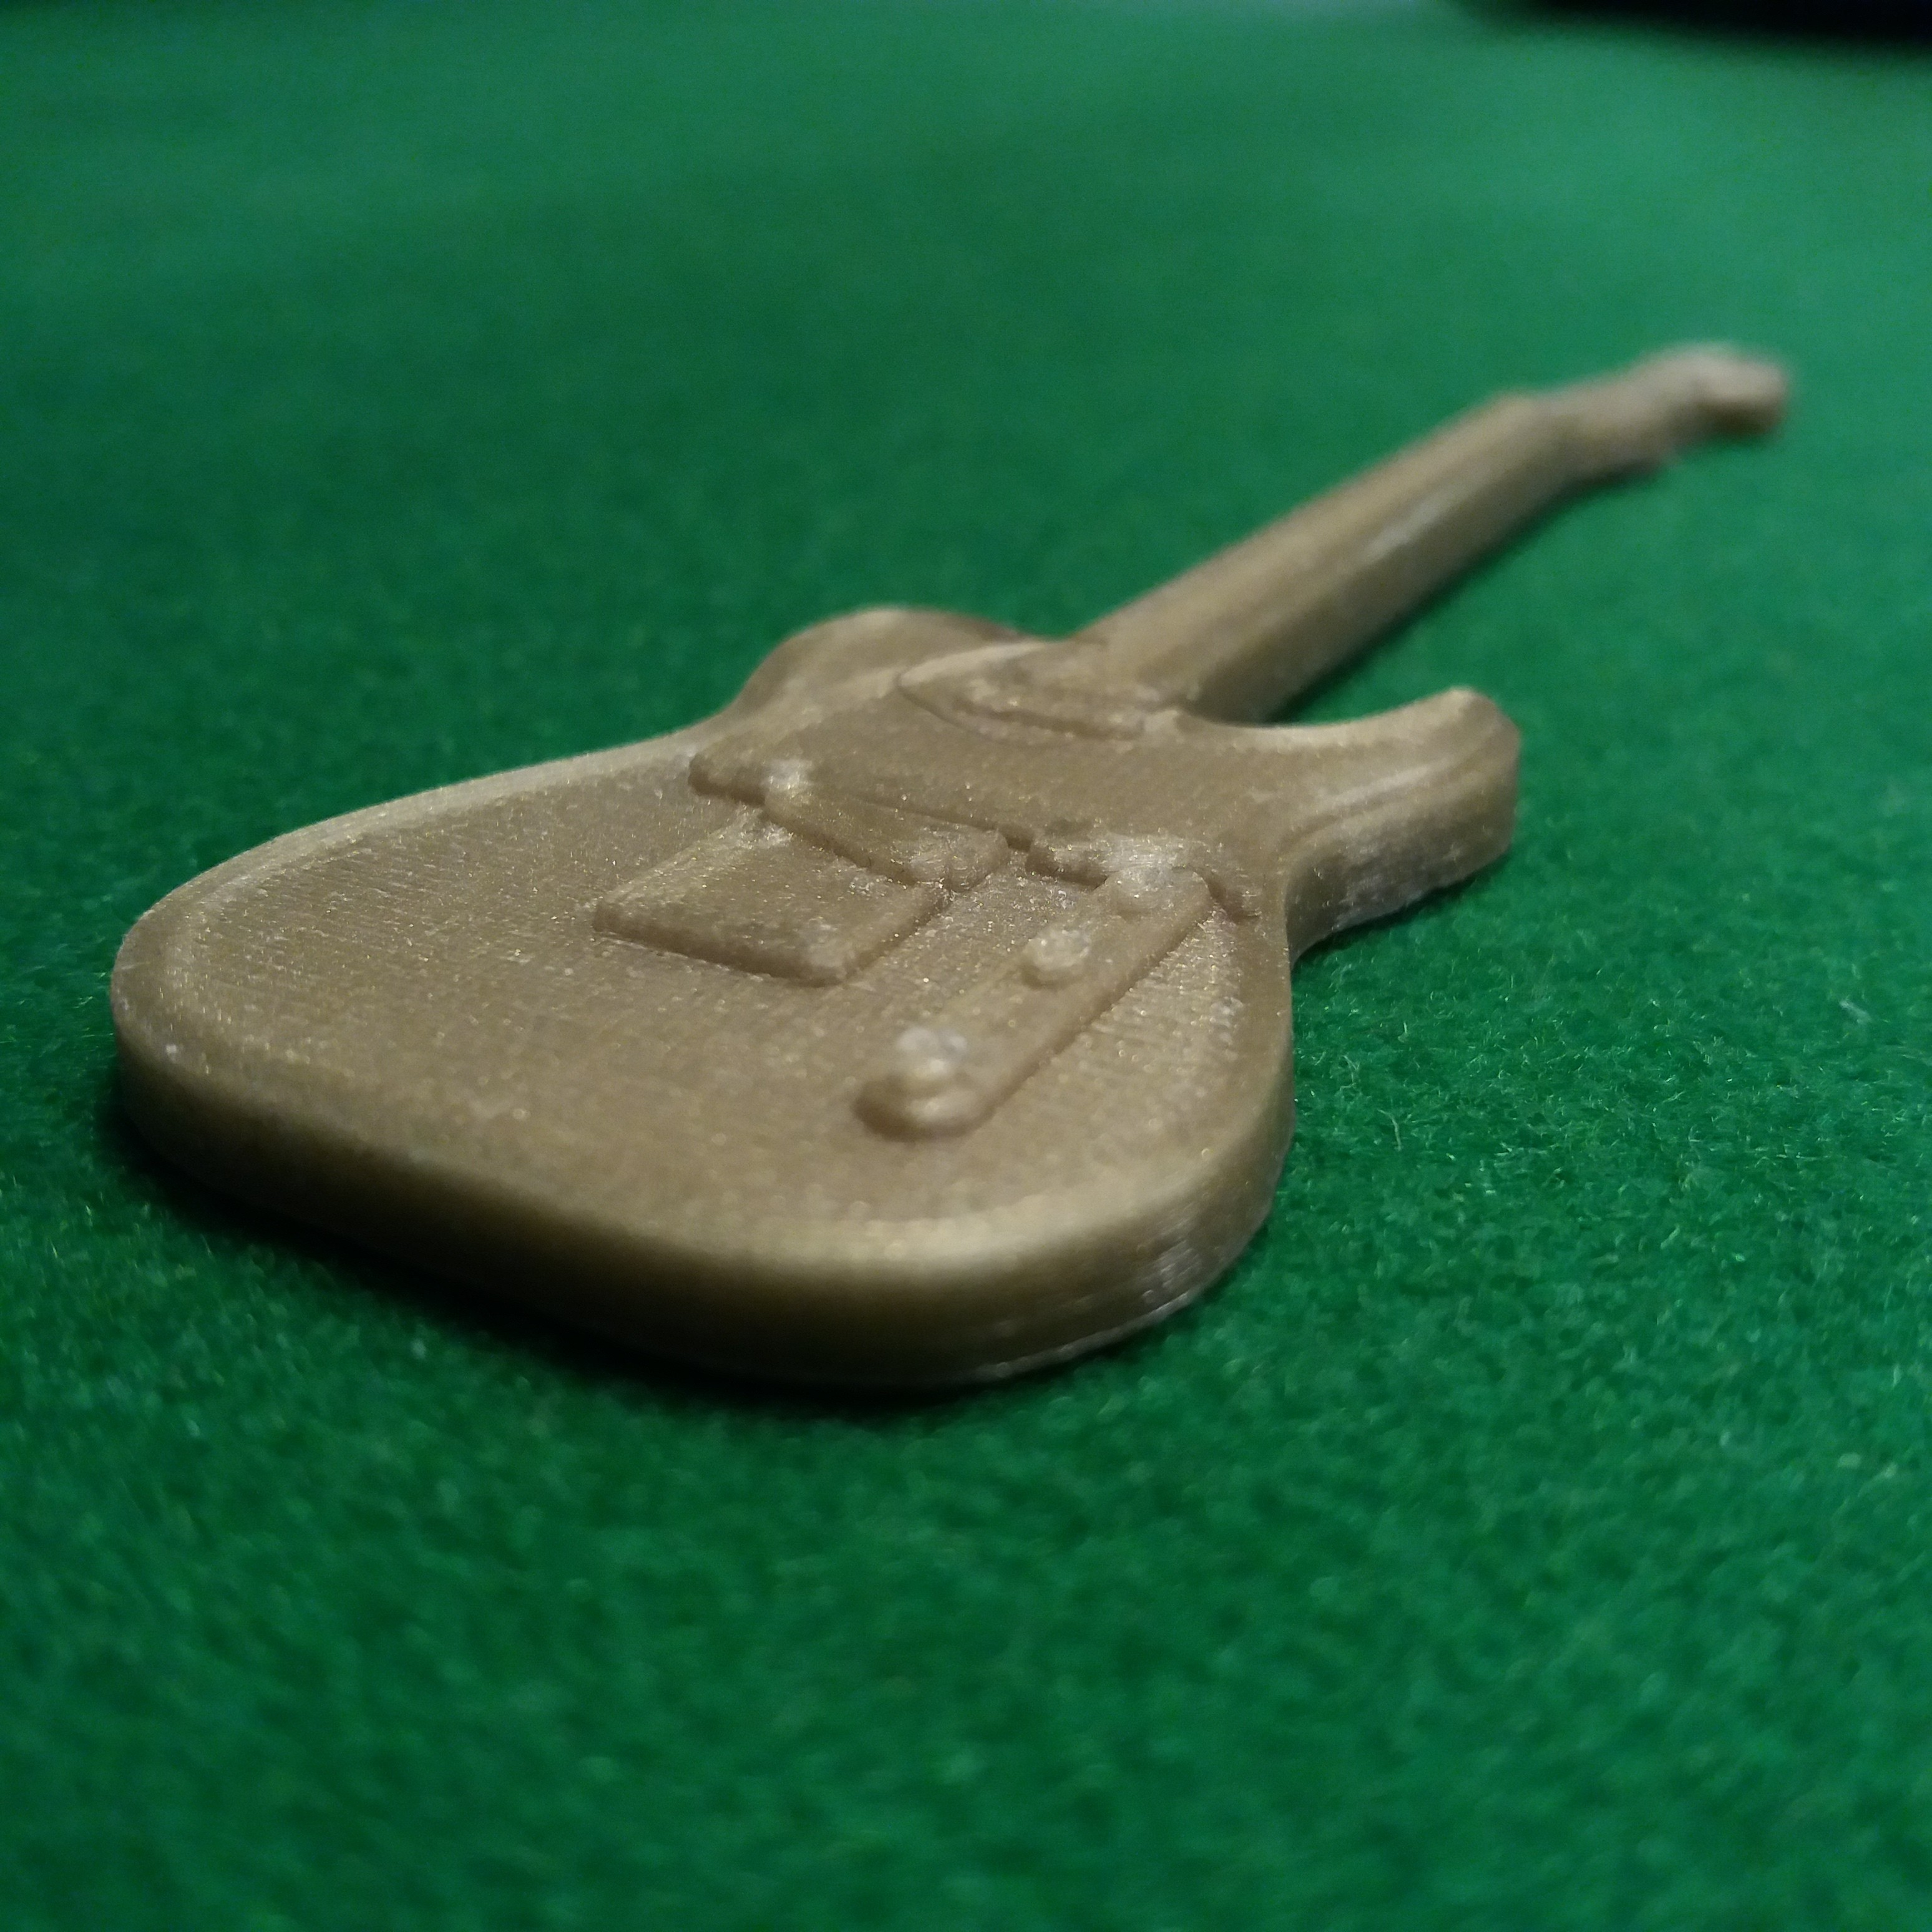 fender telecaster 2.jpg Download free STL file Fender Telecaster Guitar • 3D printer object, gerbat